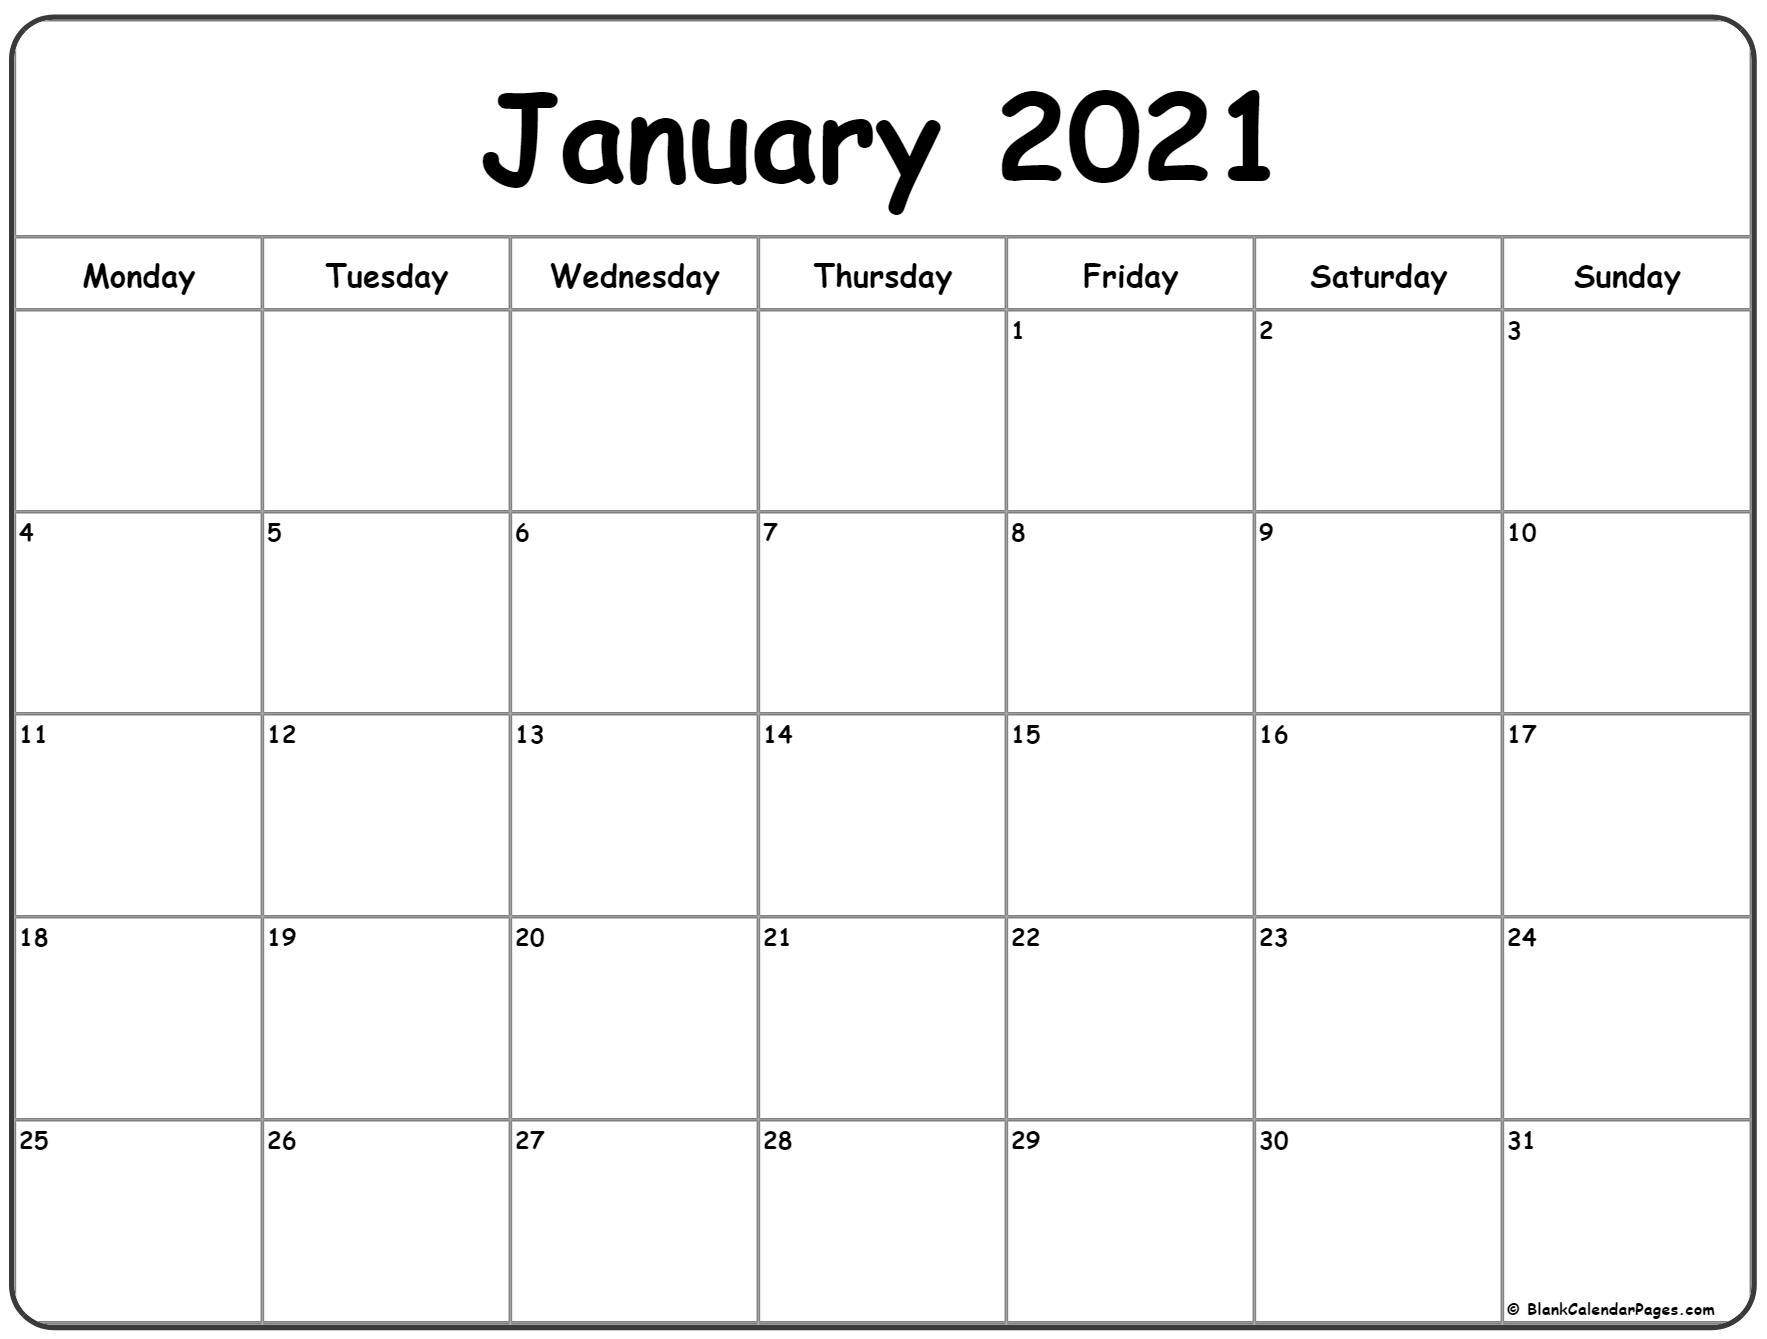 January 2021 Monday Calendar   Monday To Sunday